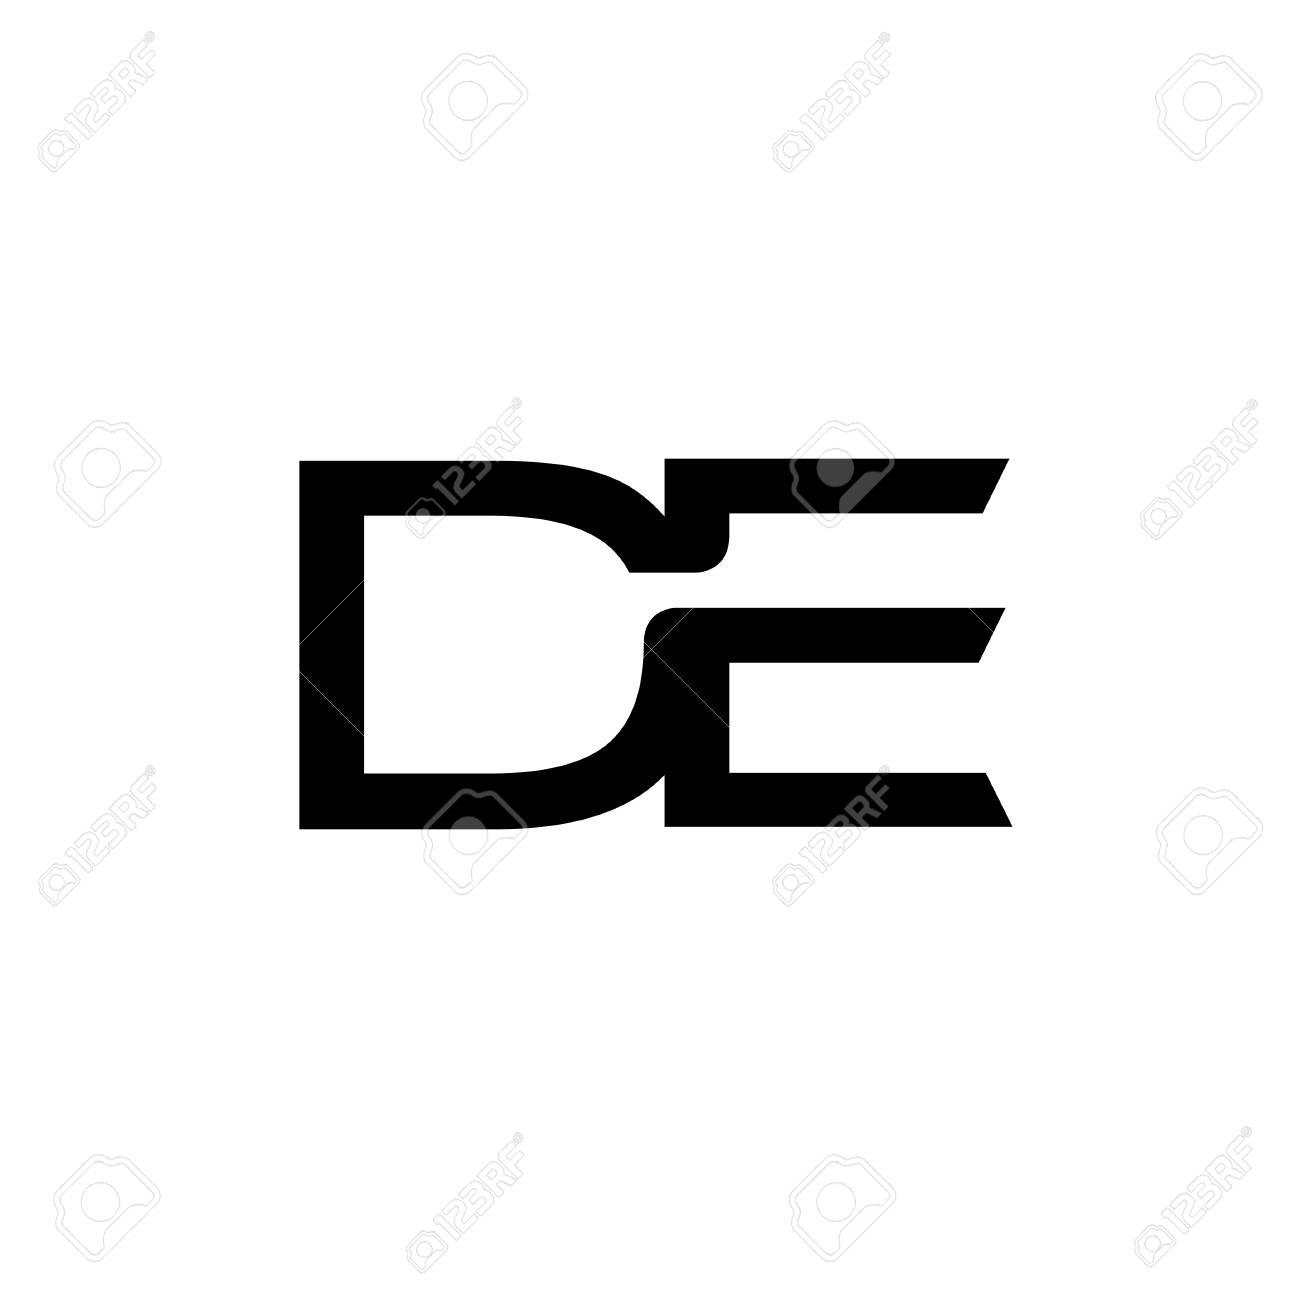 de letter logo design